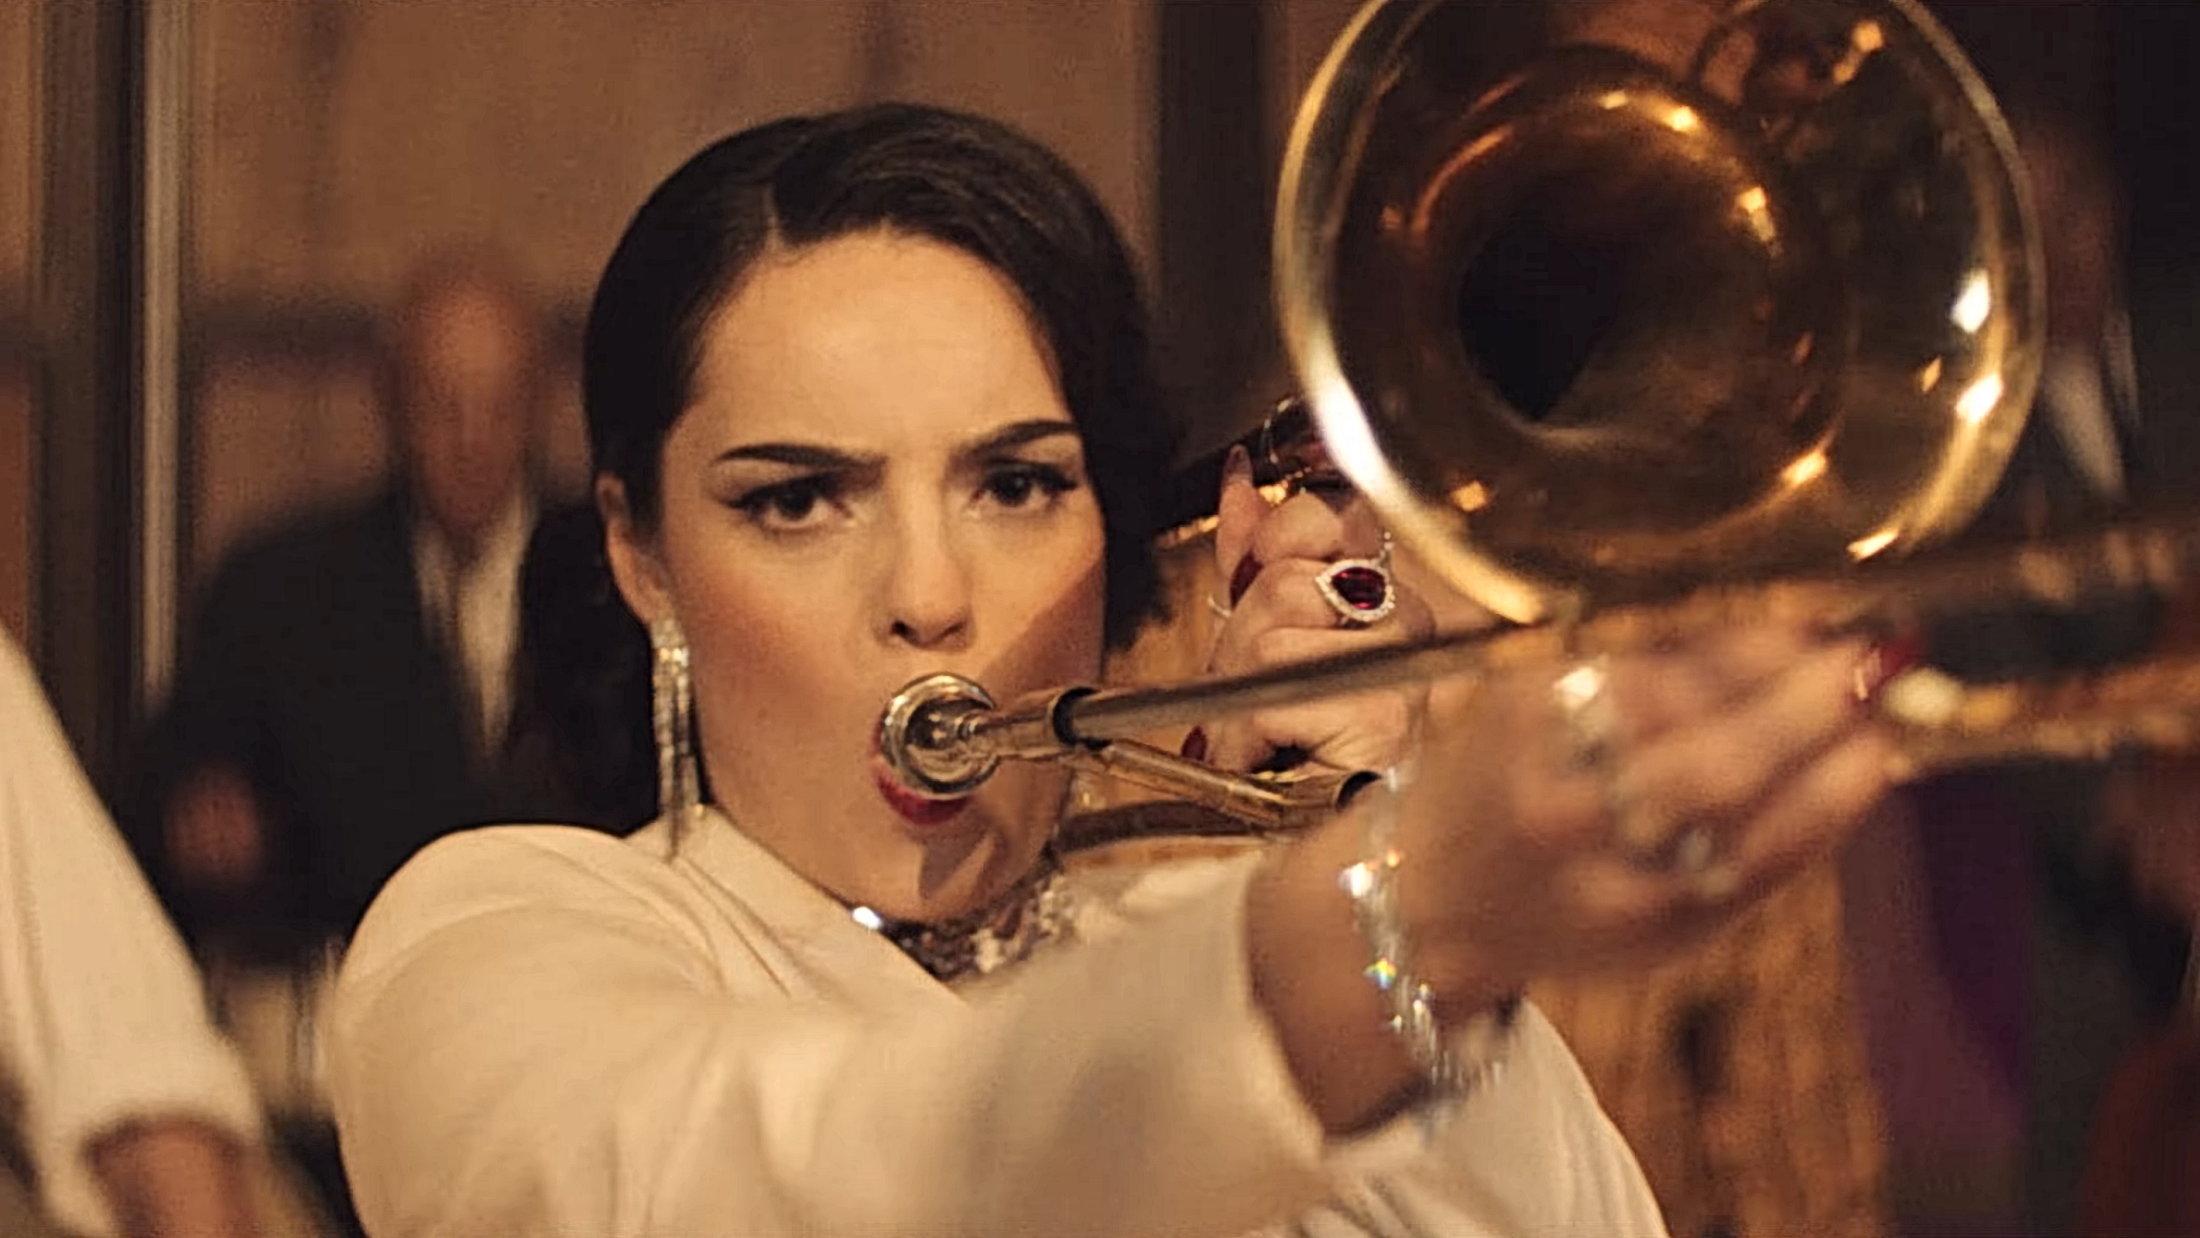 Trombone - AronChupa & Little Sis Nora OFFICIAL VIDEO 2-33 Screenshot